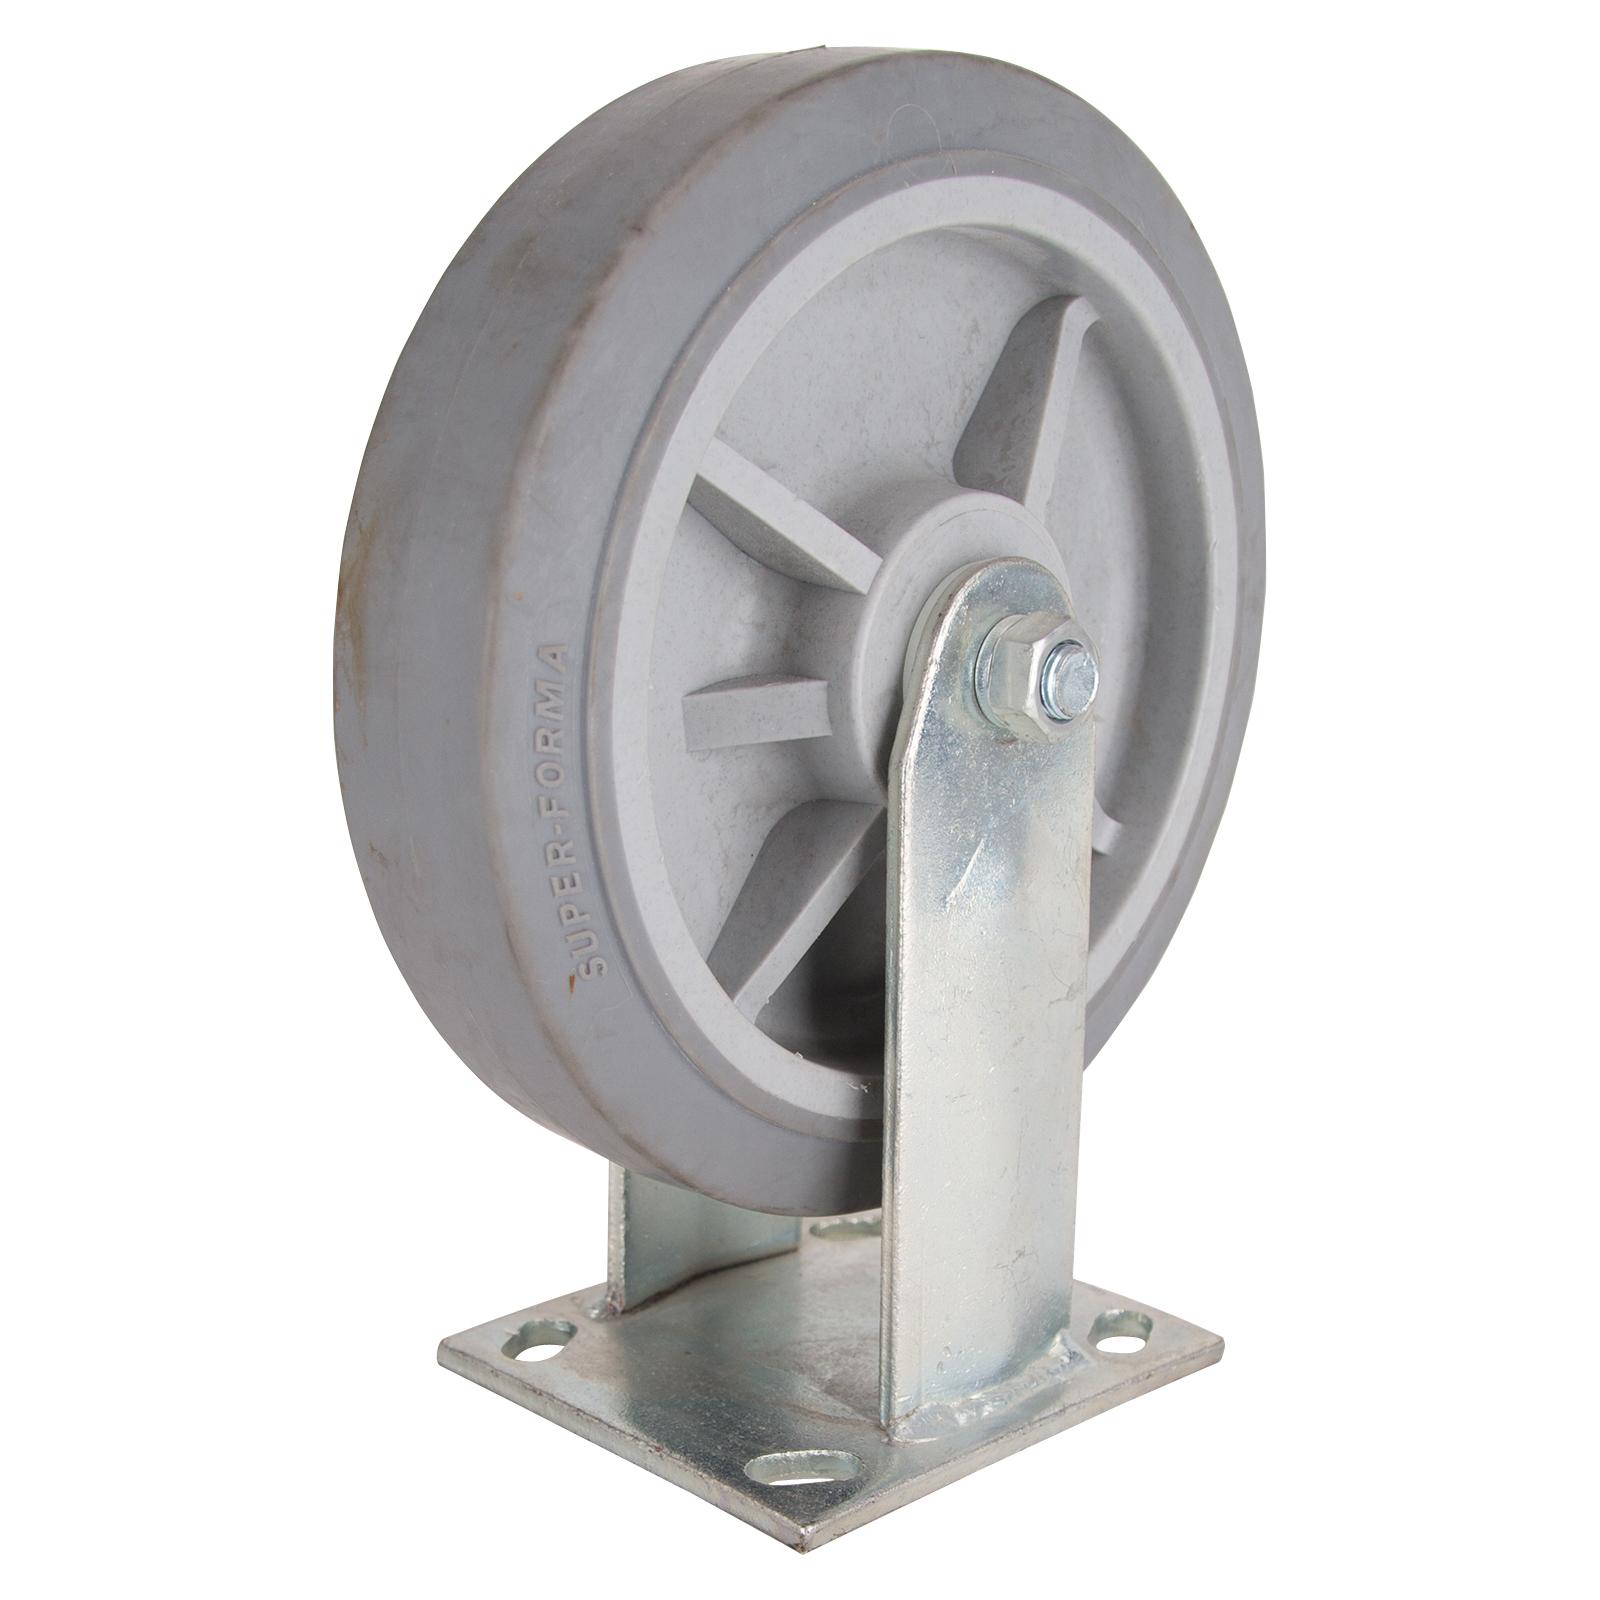 Picture of ProSource JC-T07 Rigid Caster, 8 in Dia Wheel, 2 in W Wheel, Thermoplastic Rubber Wheel, 750 lb